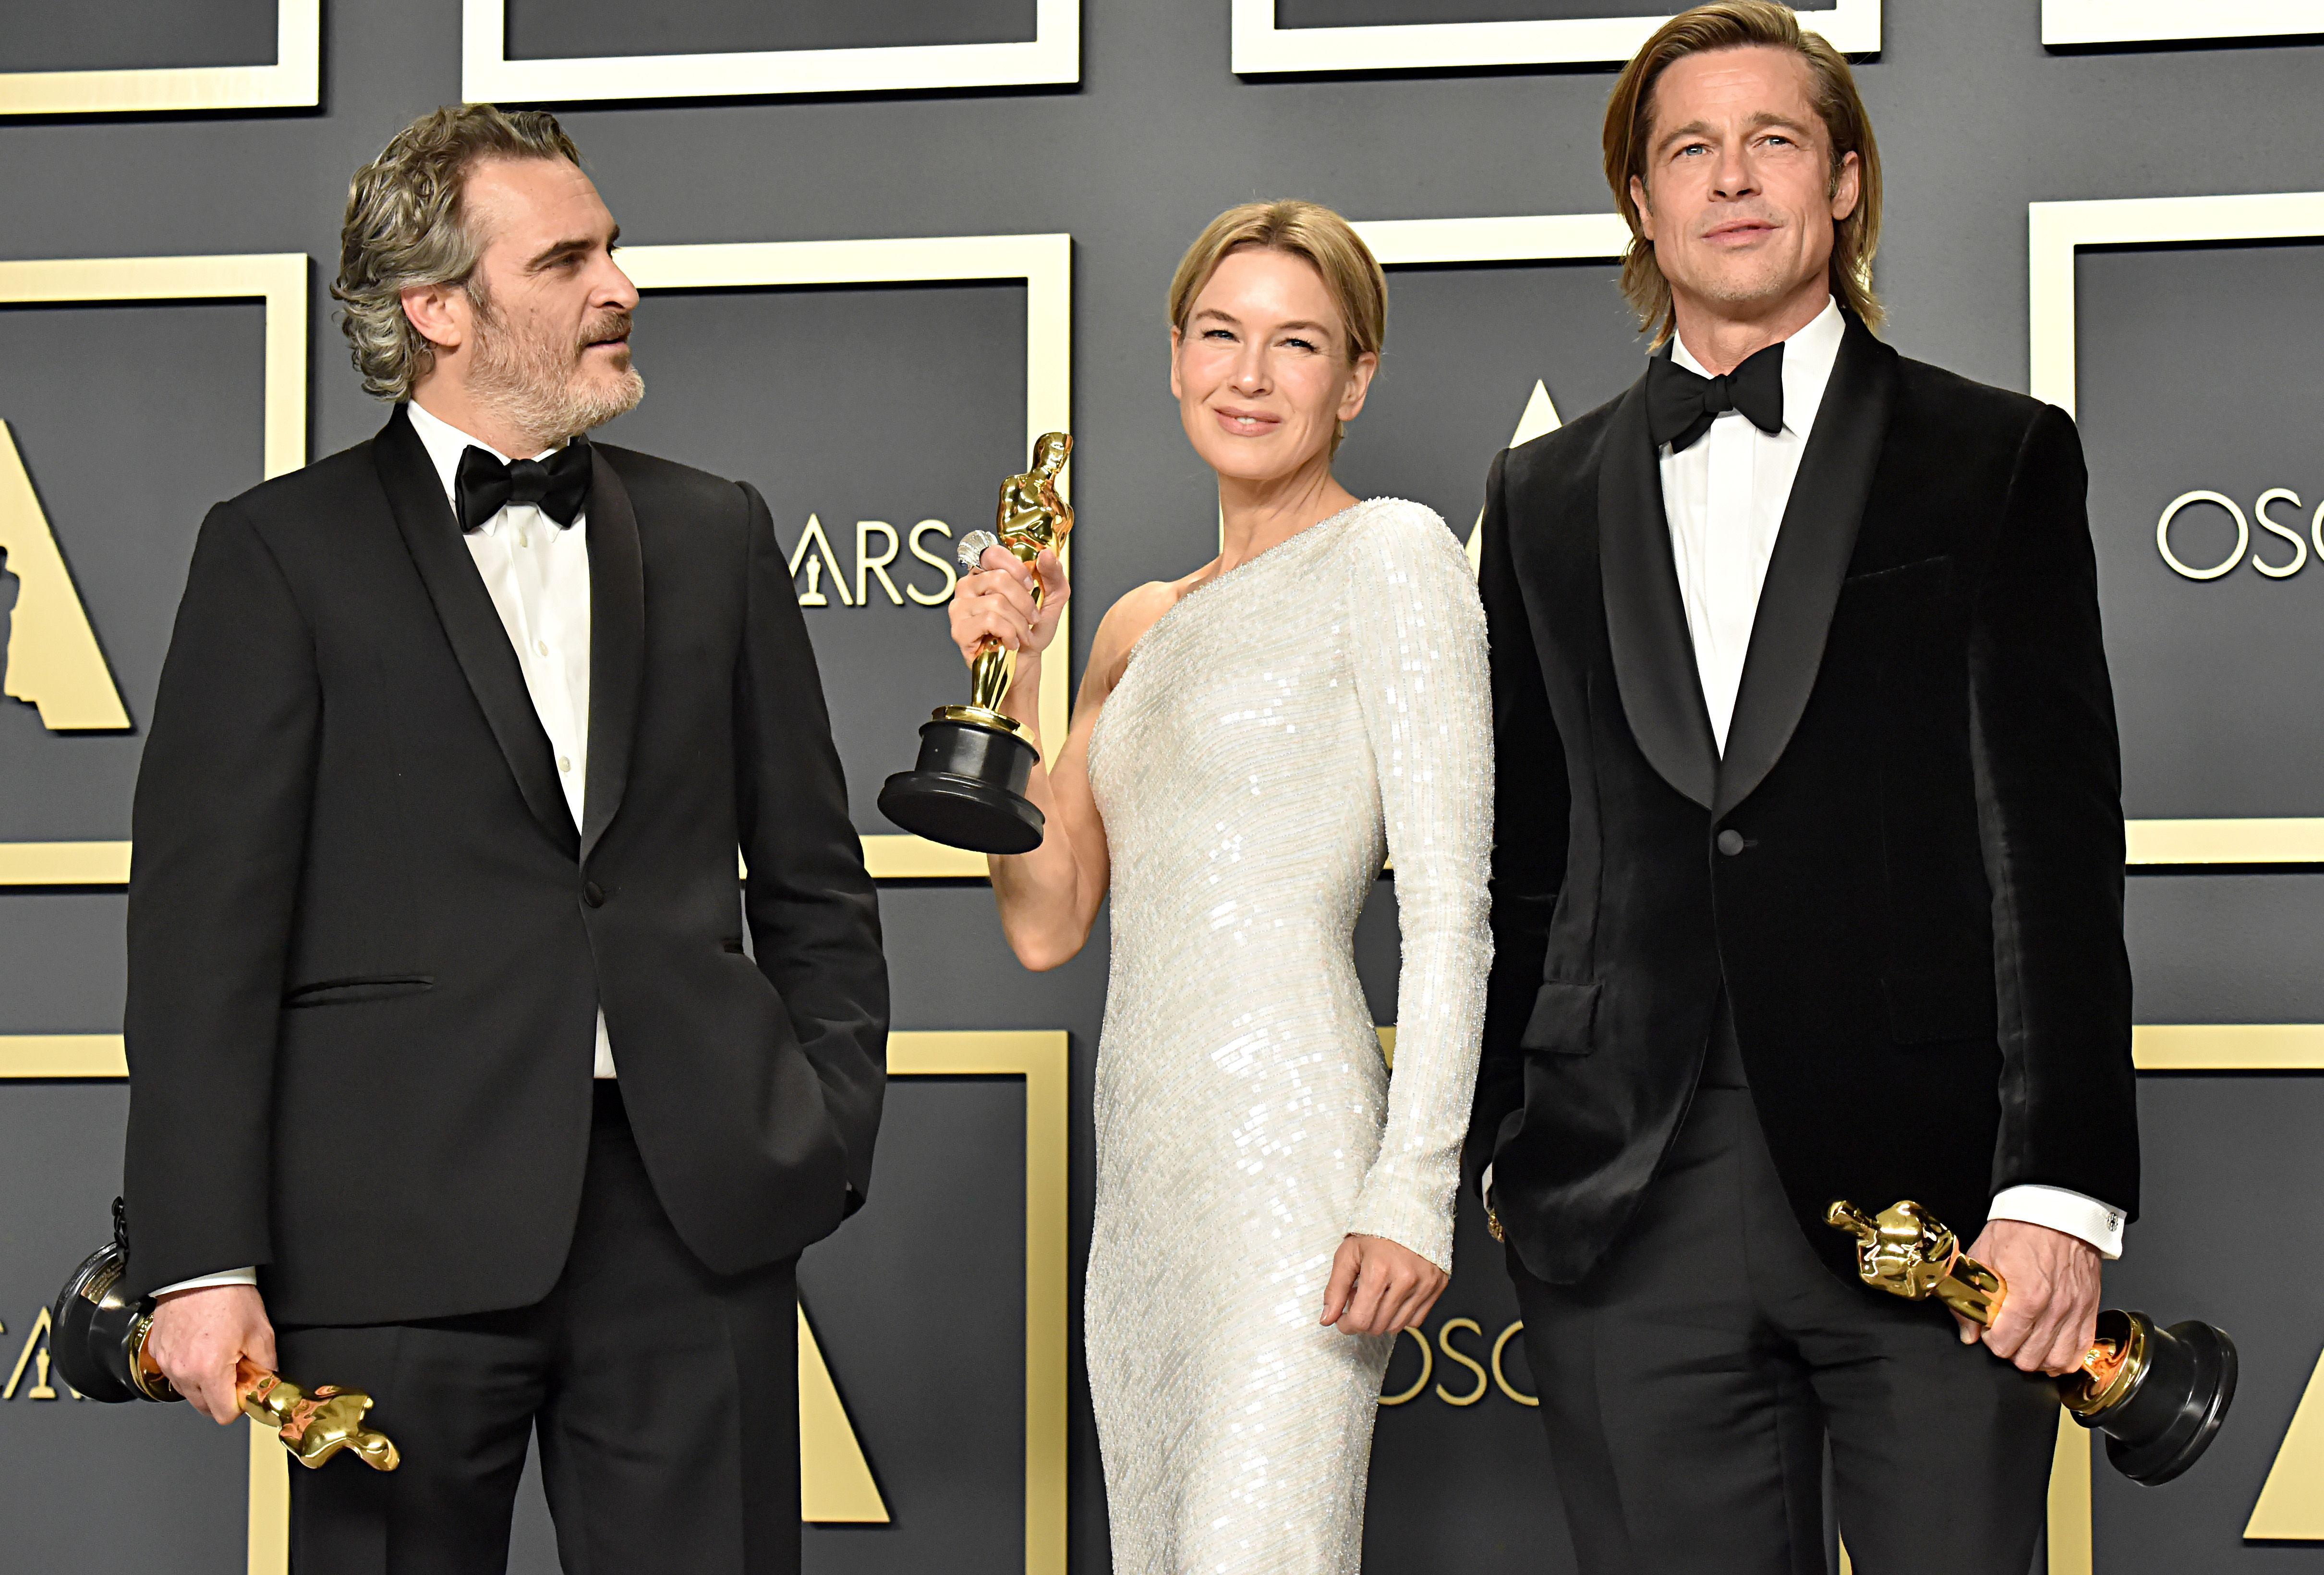 The Oscars 2020: full winners' list